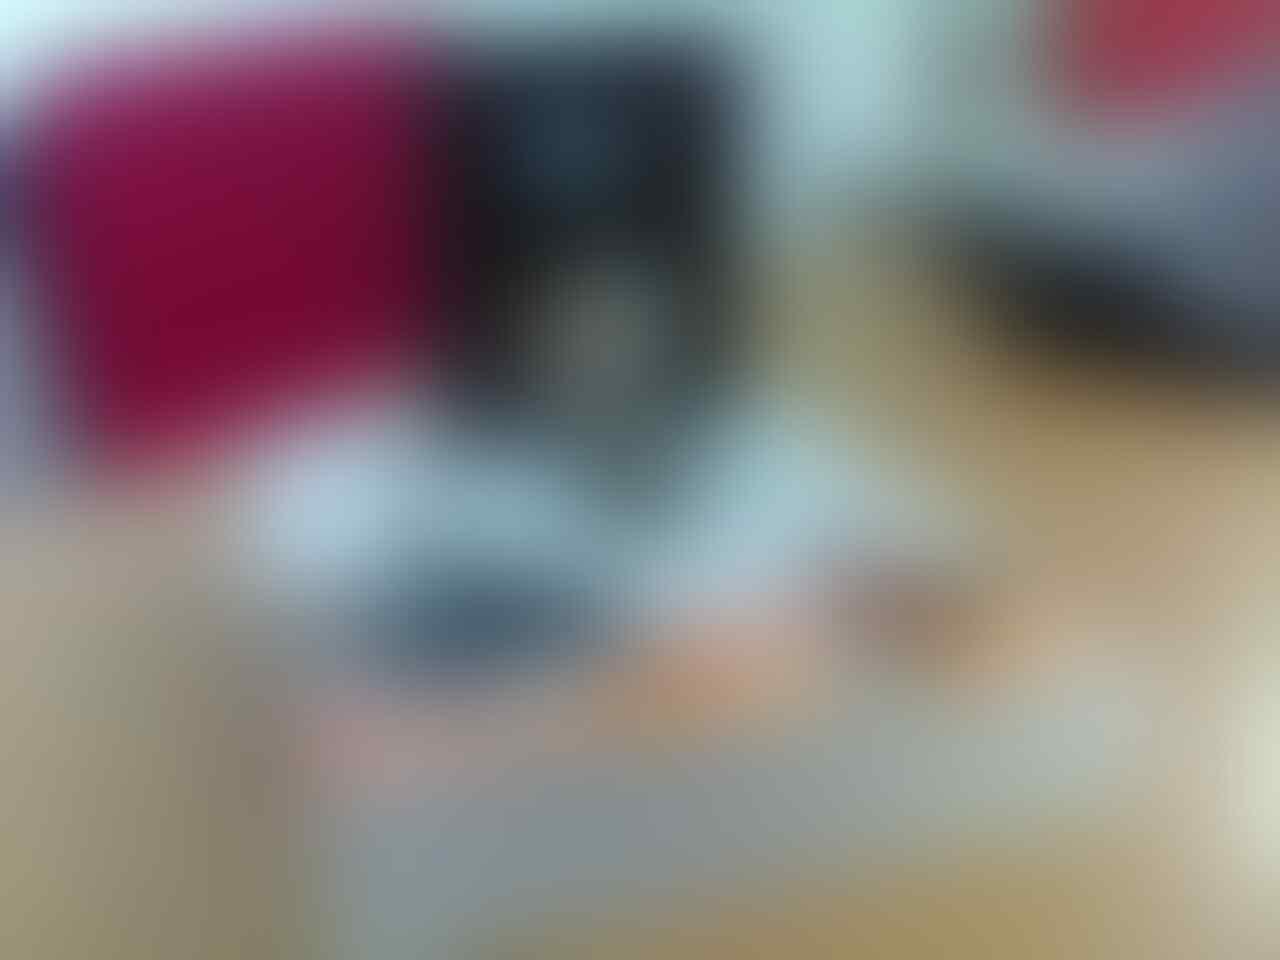 Jual Modem Sierra 313U 100 mbps LTE/4G harga murah